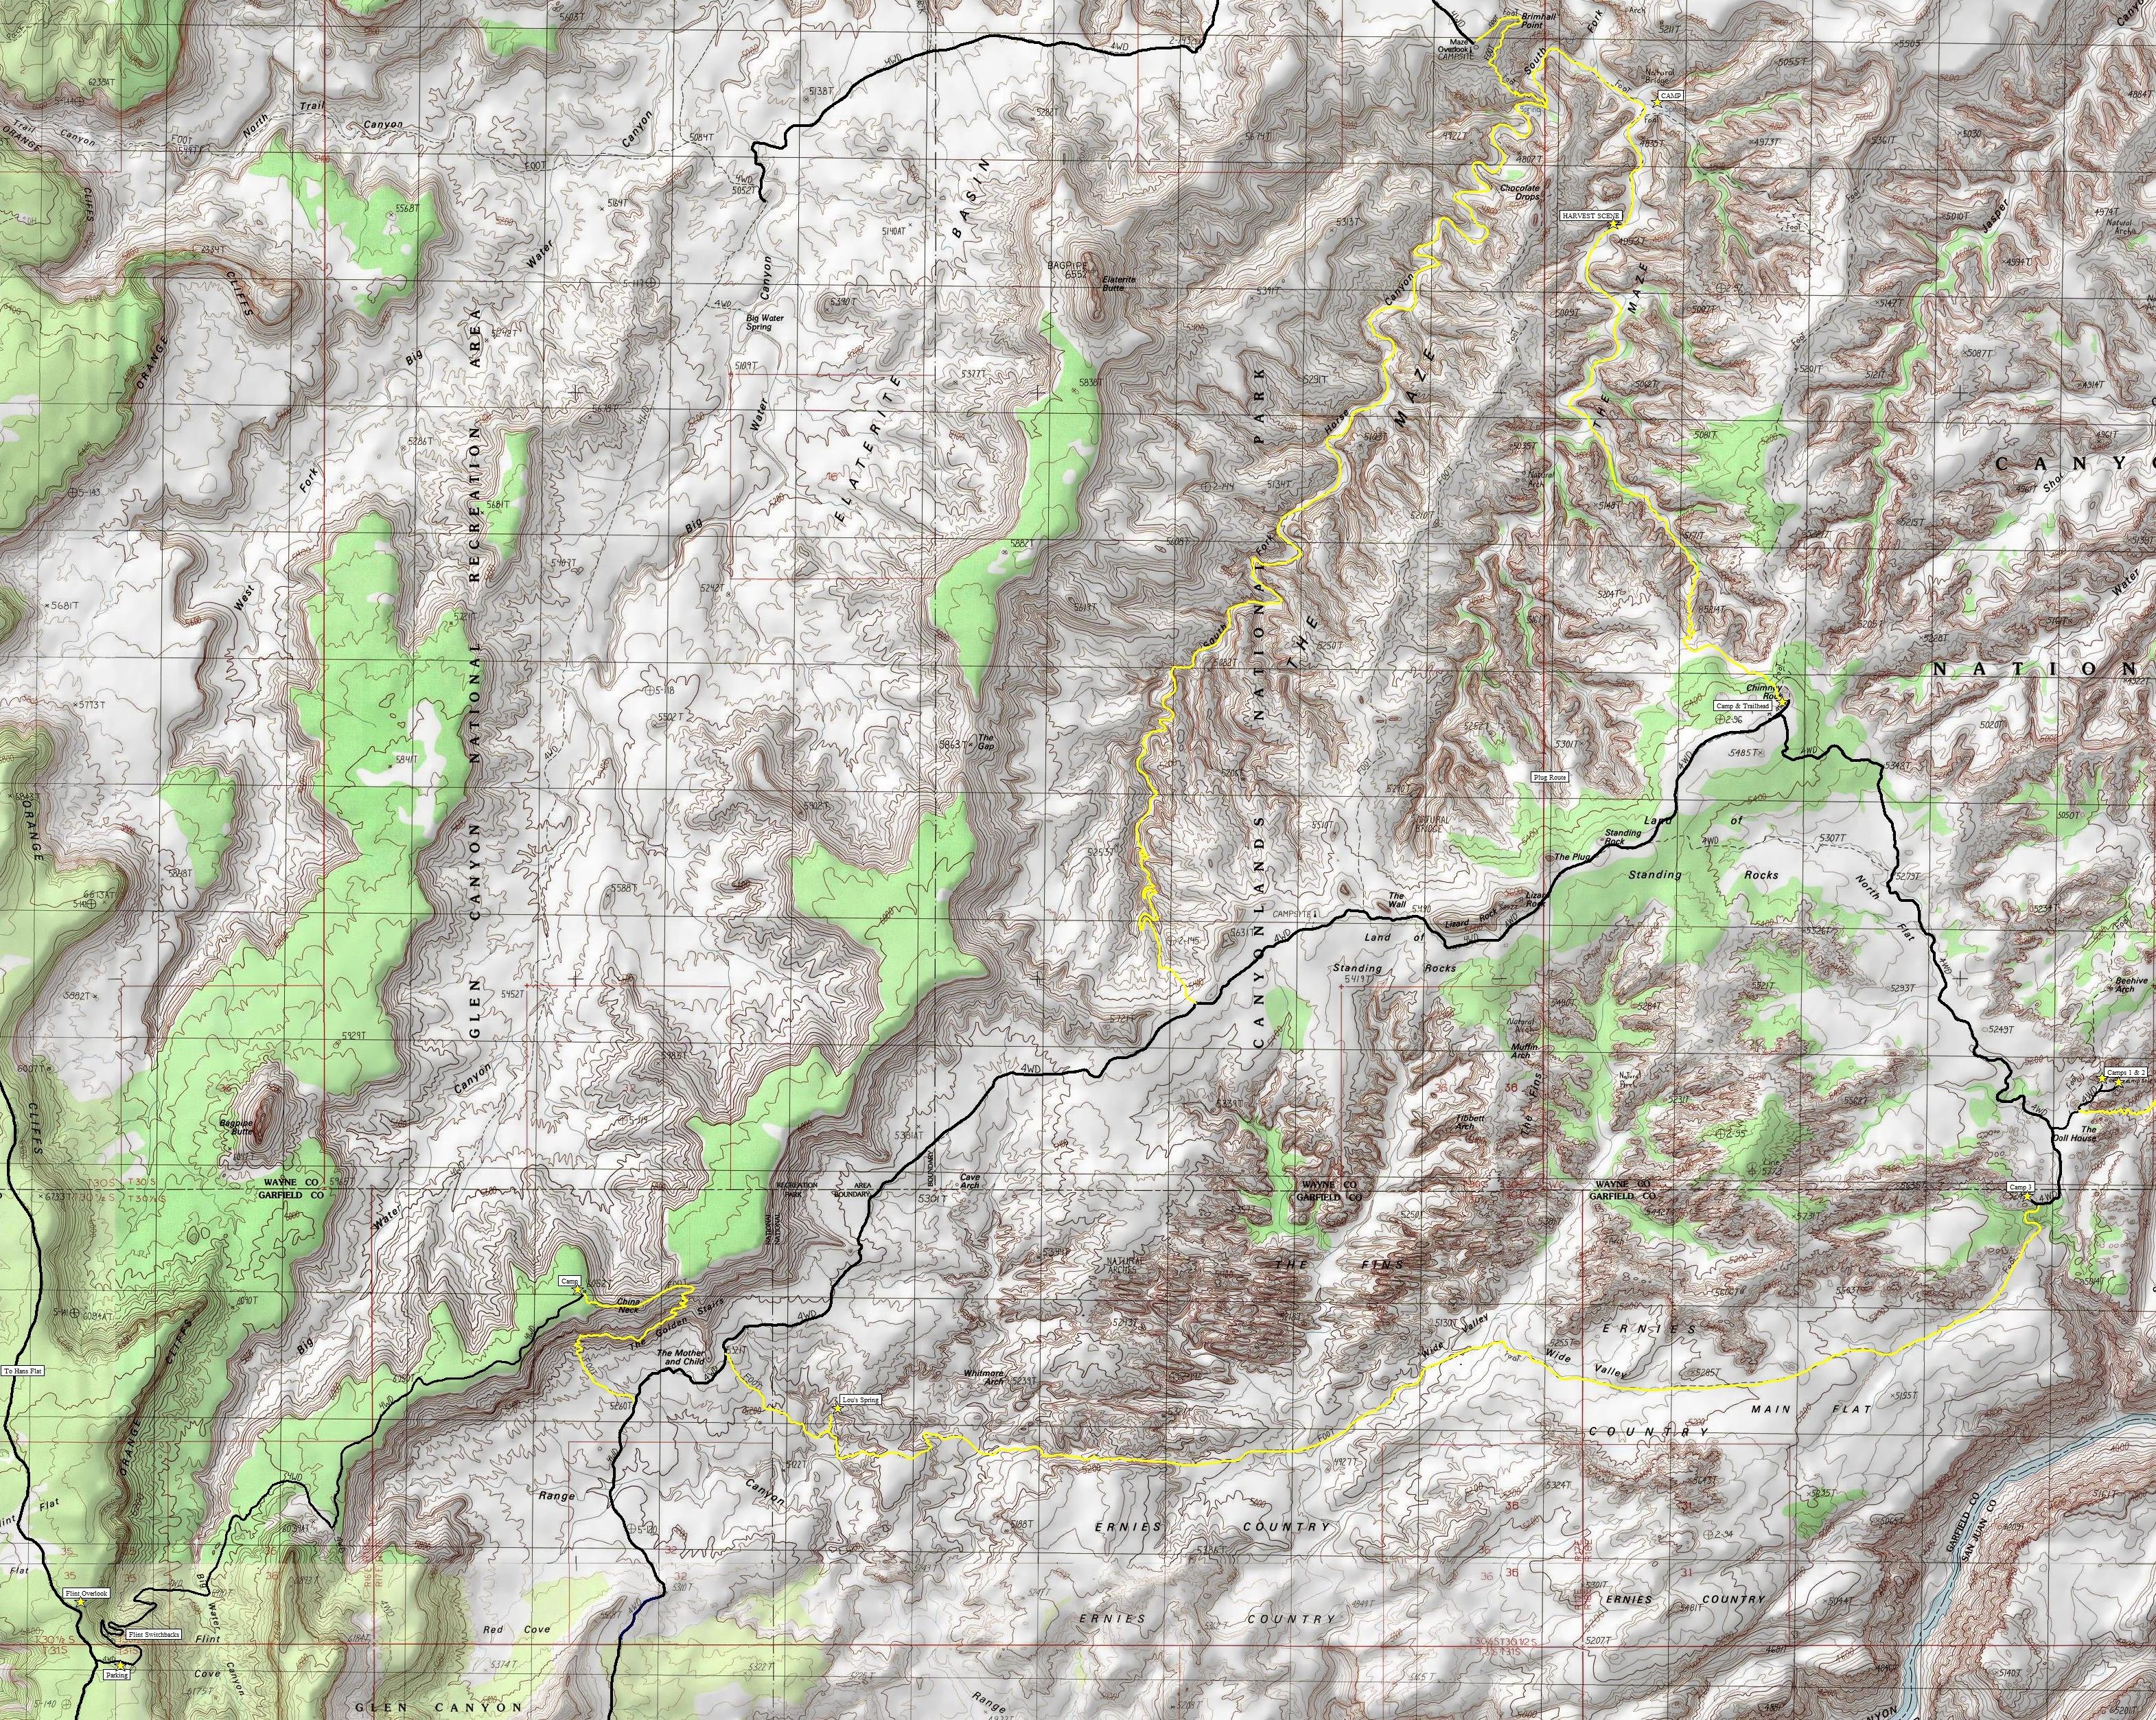 Canyonlands National Park Maze District Information